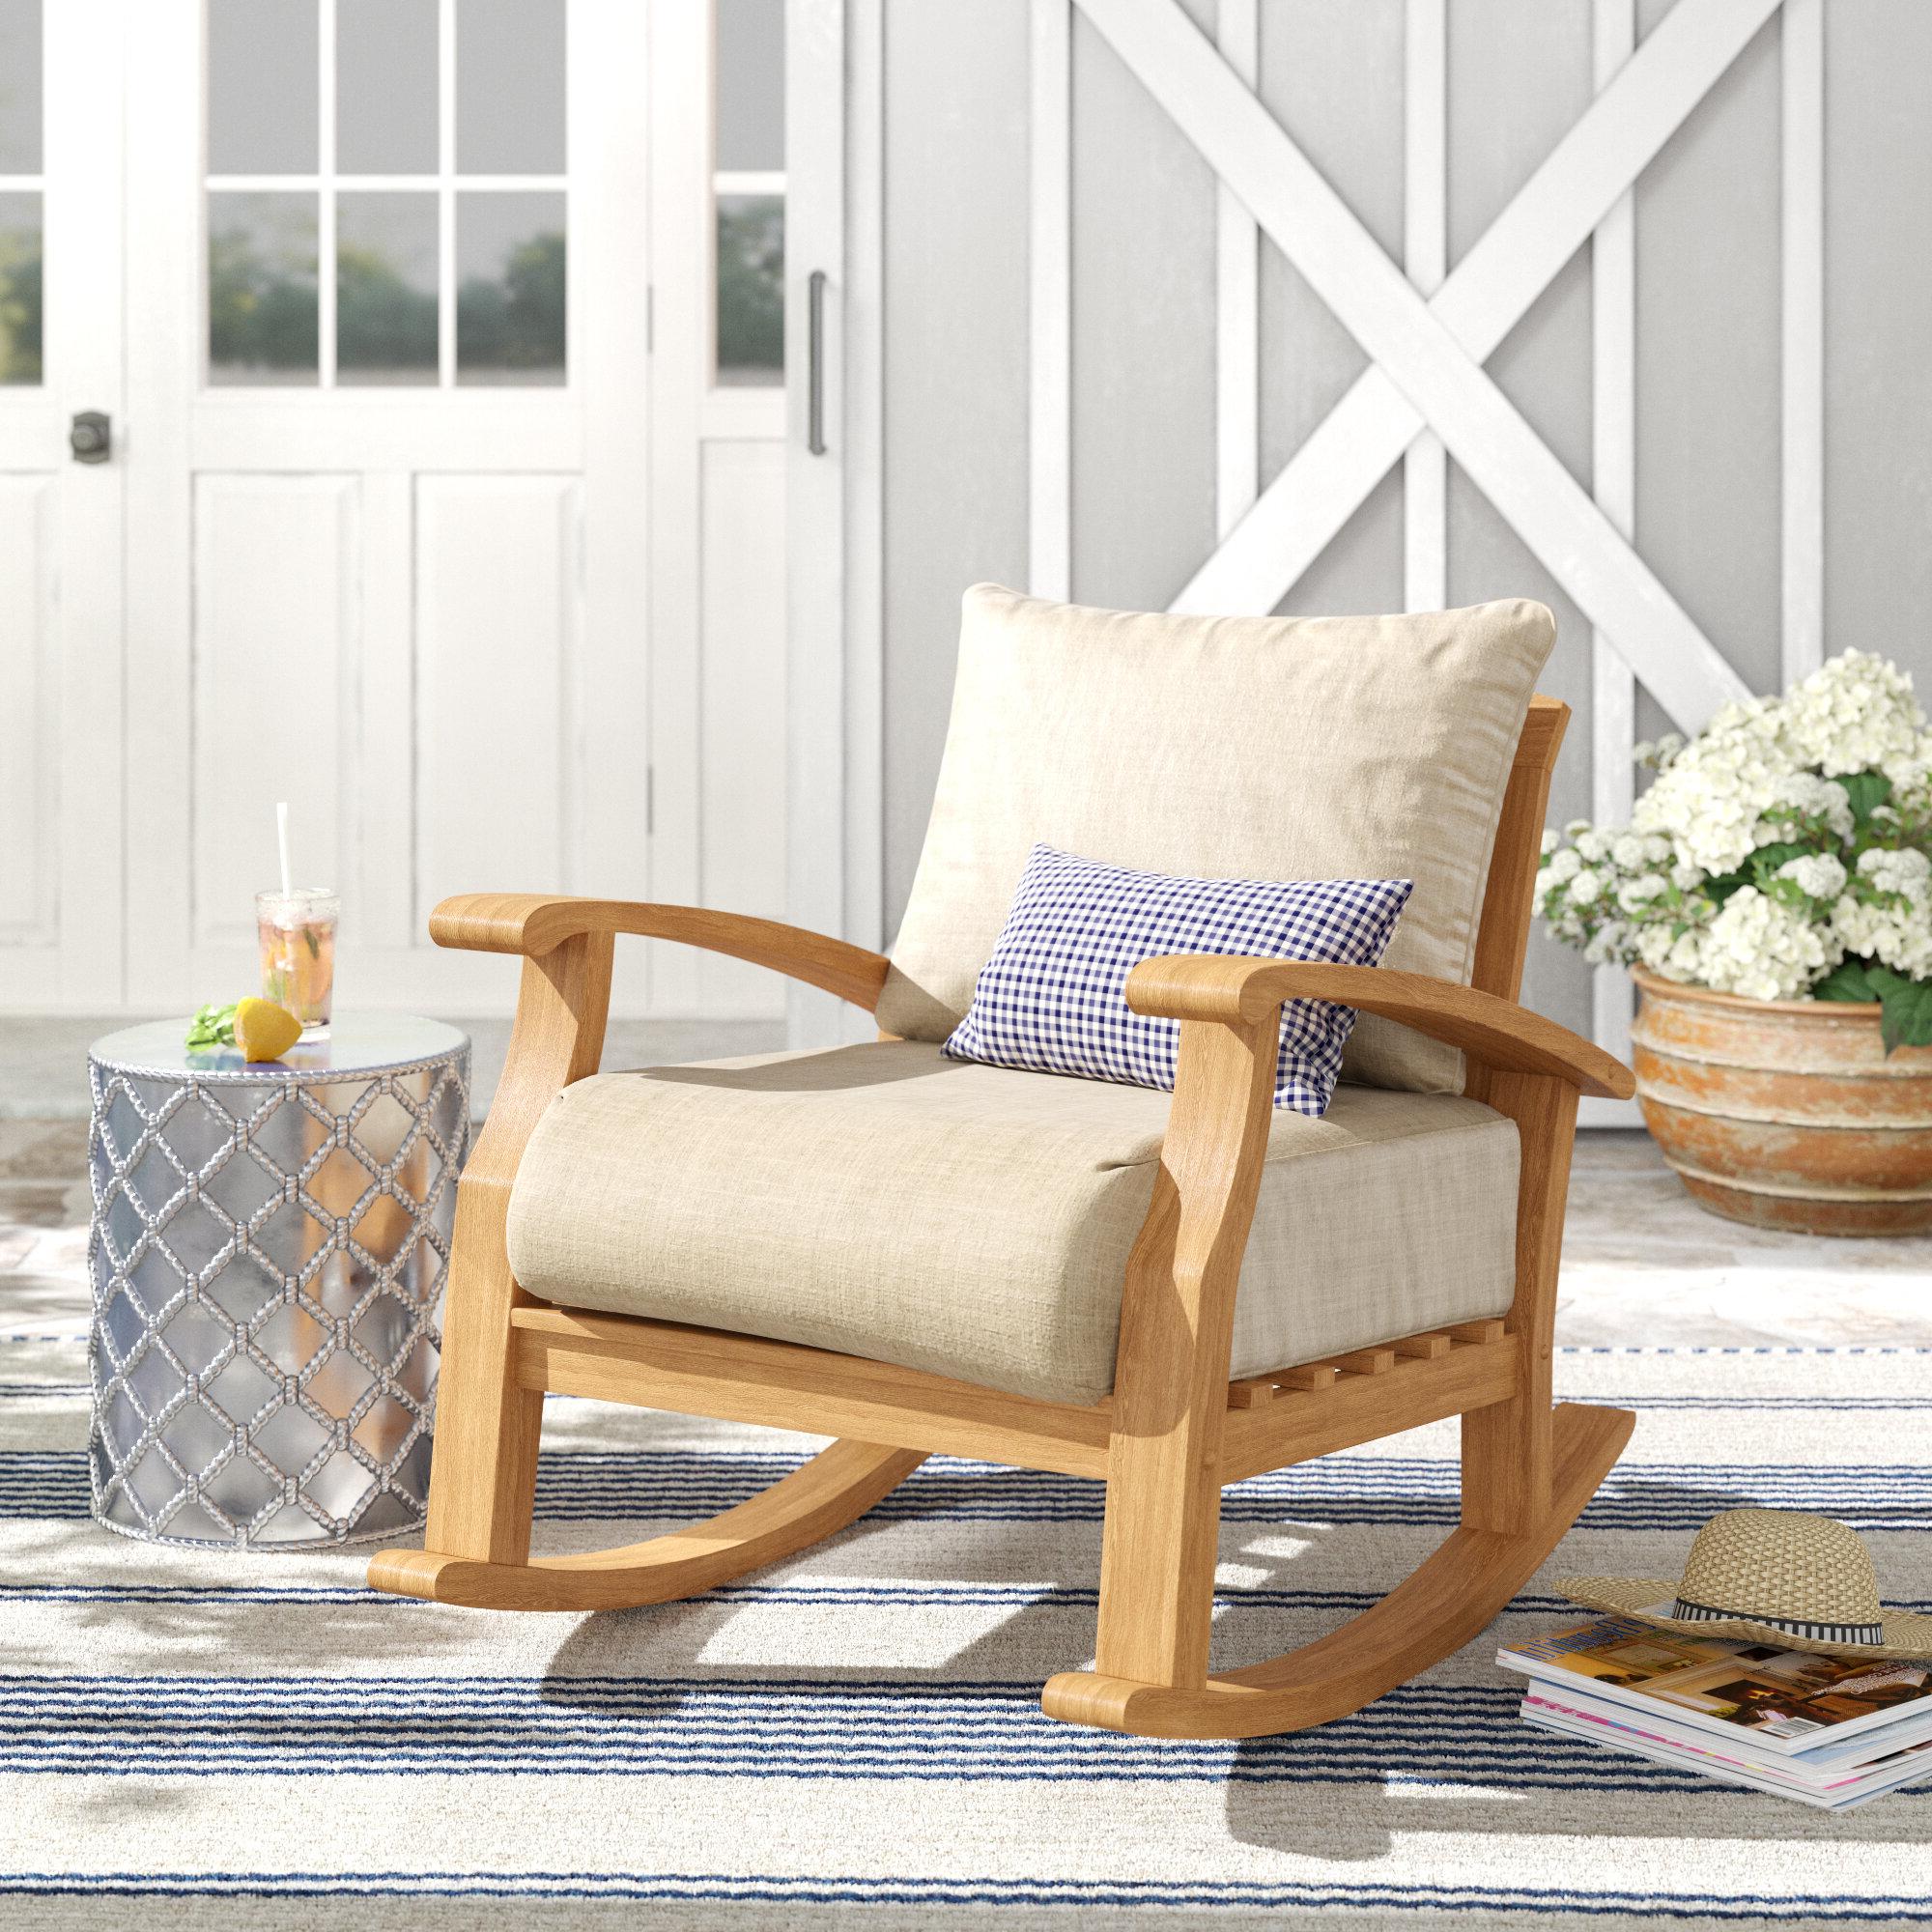 Preferred Summerton Teak Loveseats With Cushions With Summerton Teak Rocking Chair With Cushions (Gallery 9 of 20)